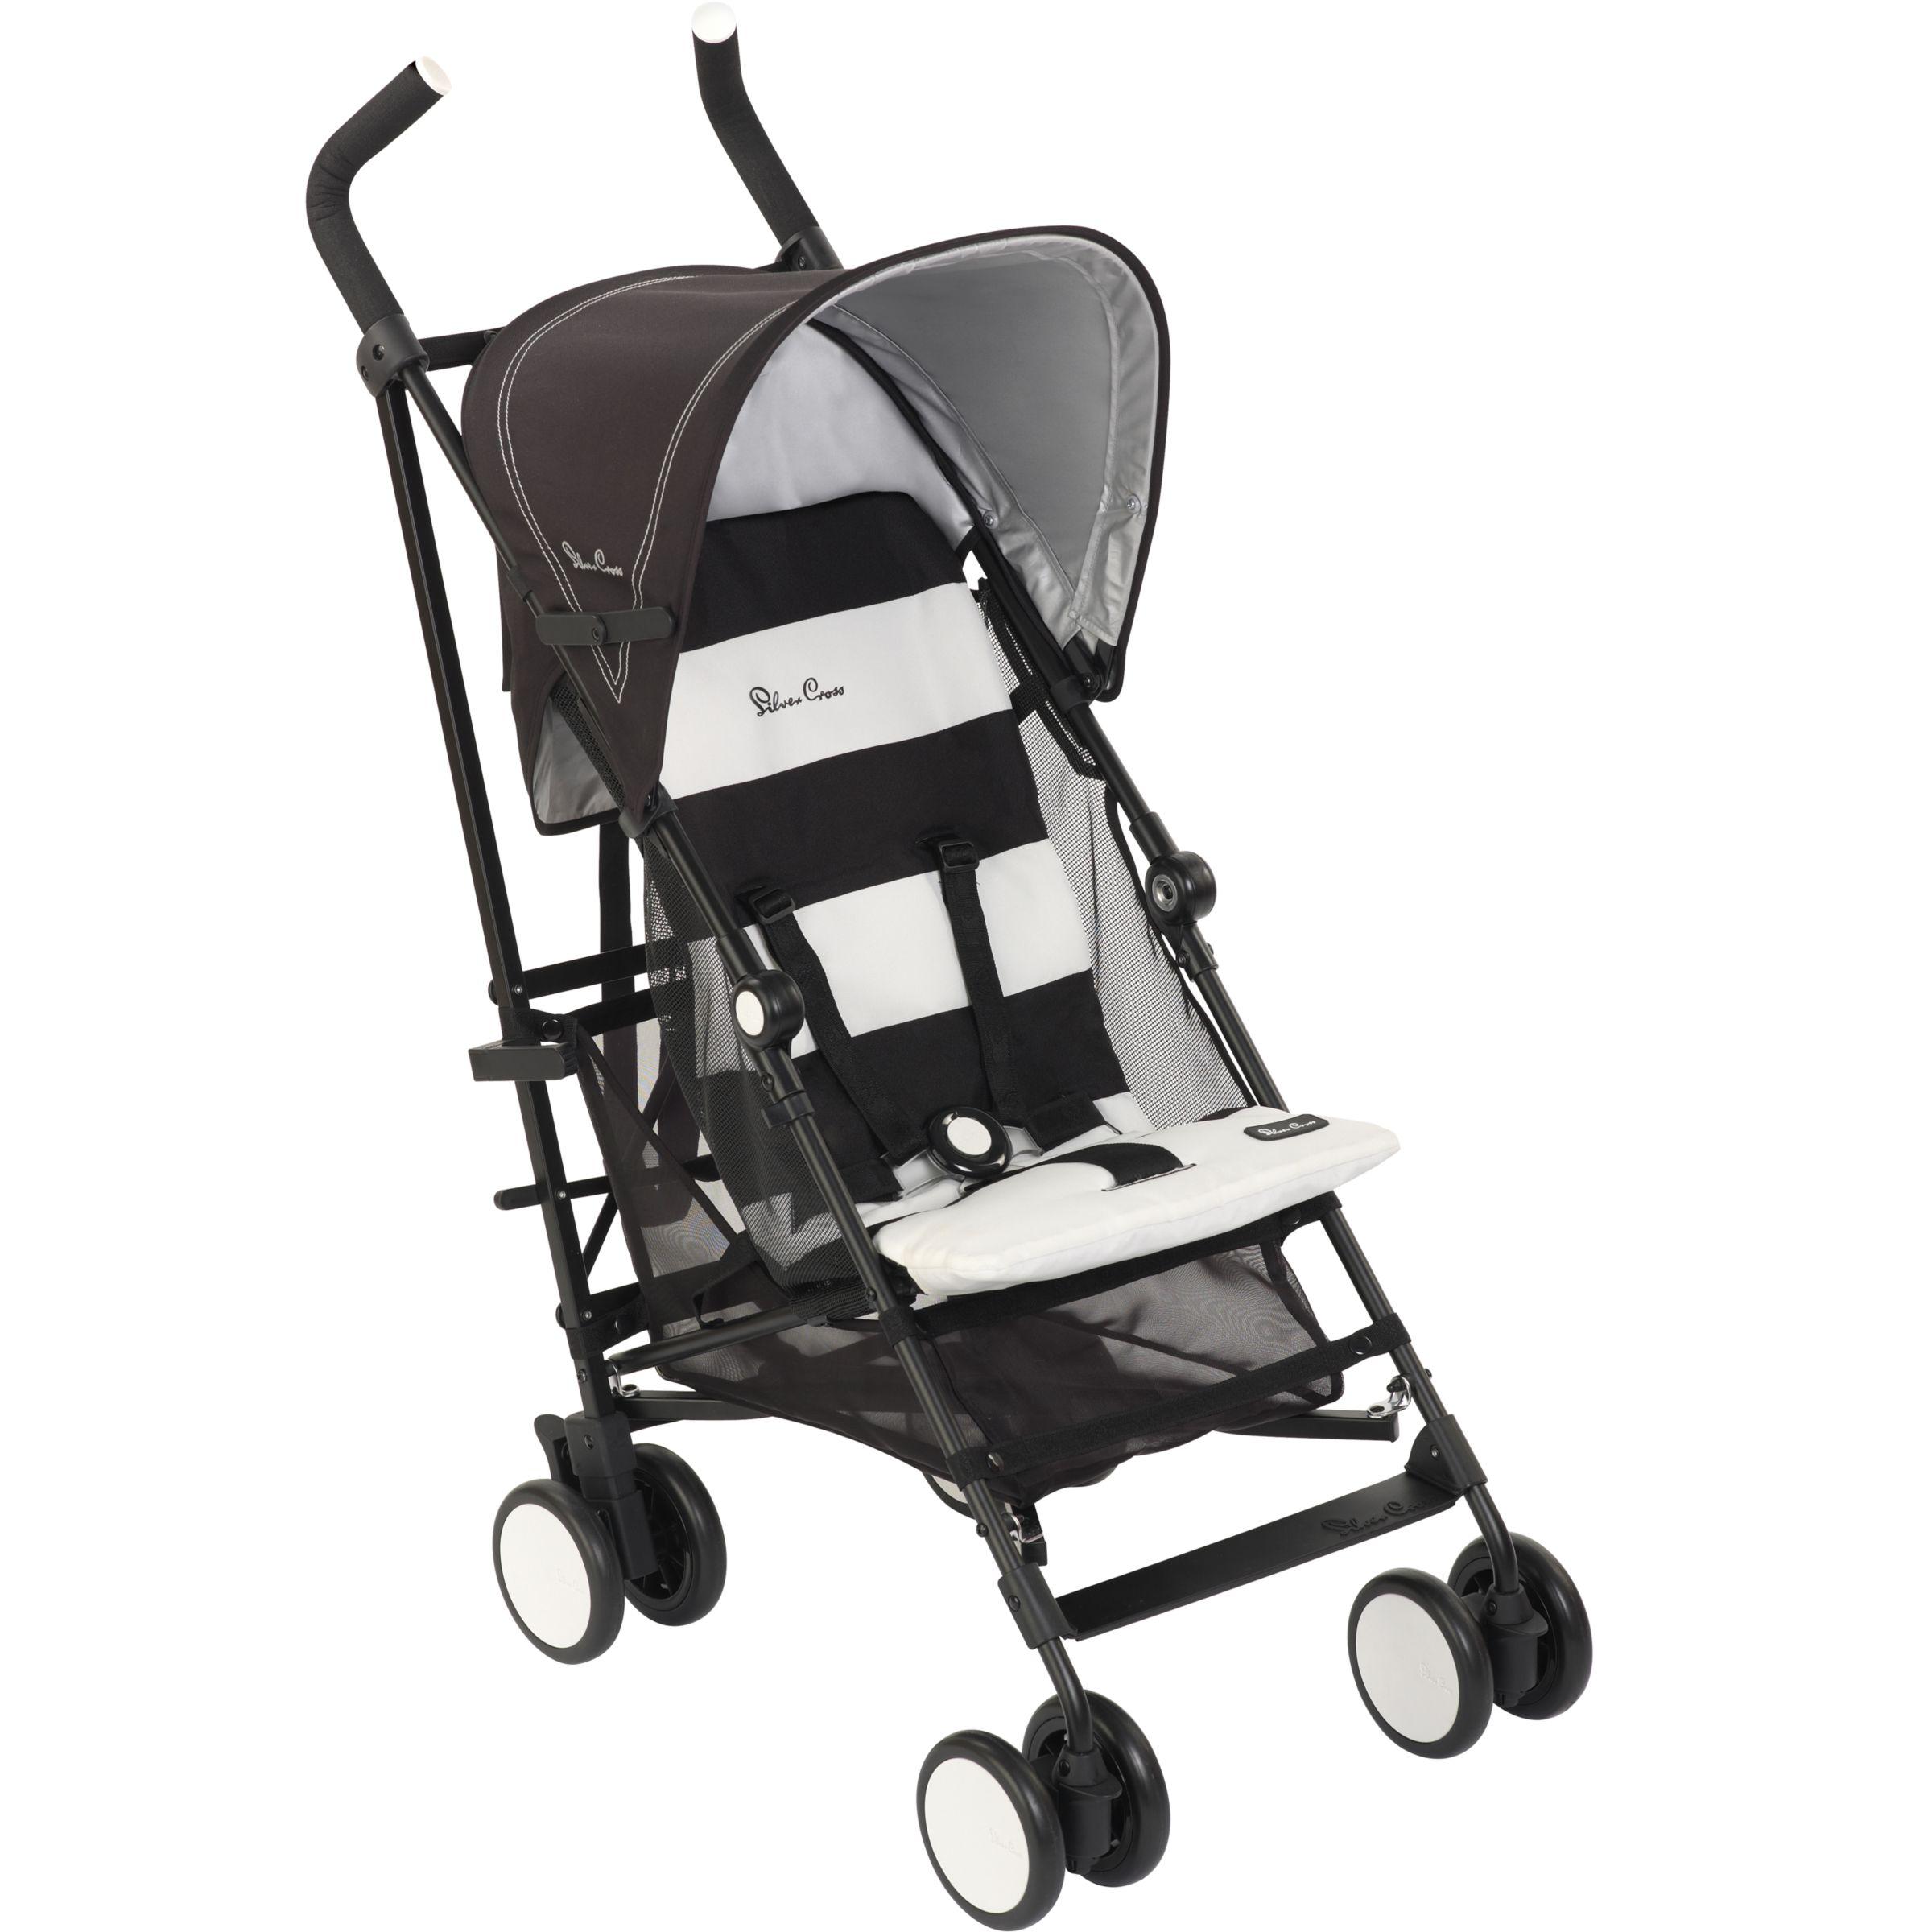 Fizz Stroller, Humbug